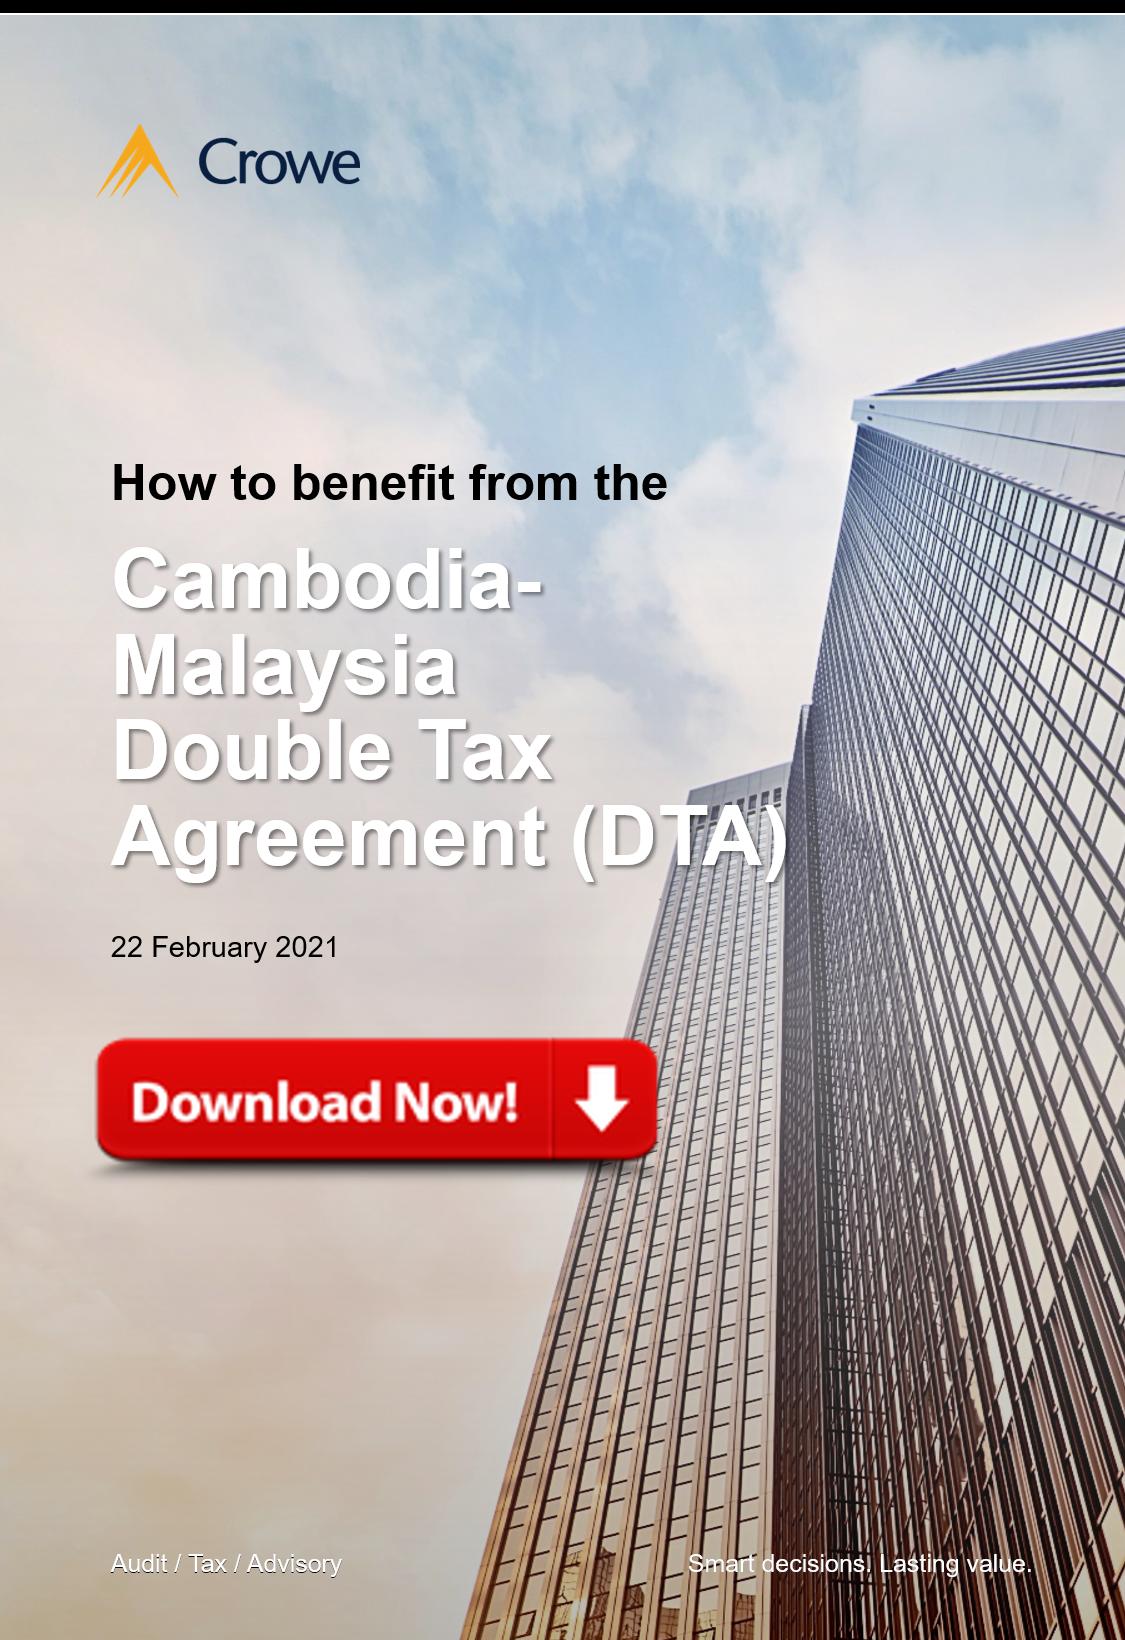 Cambodia Malaysia Double Tax Agreement (DTA)